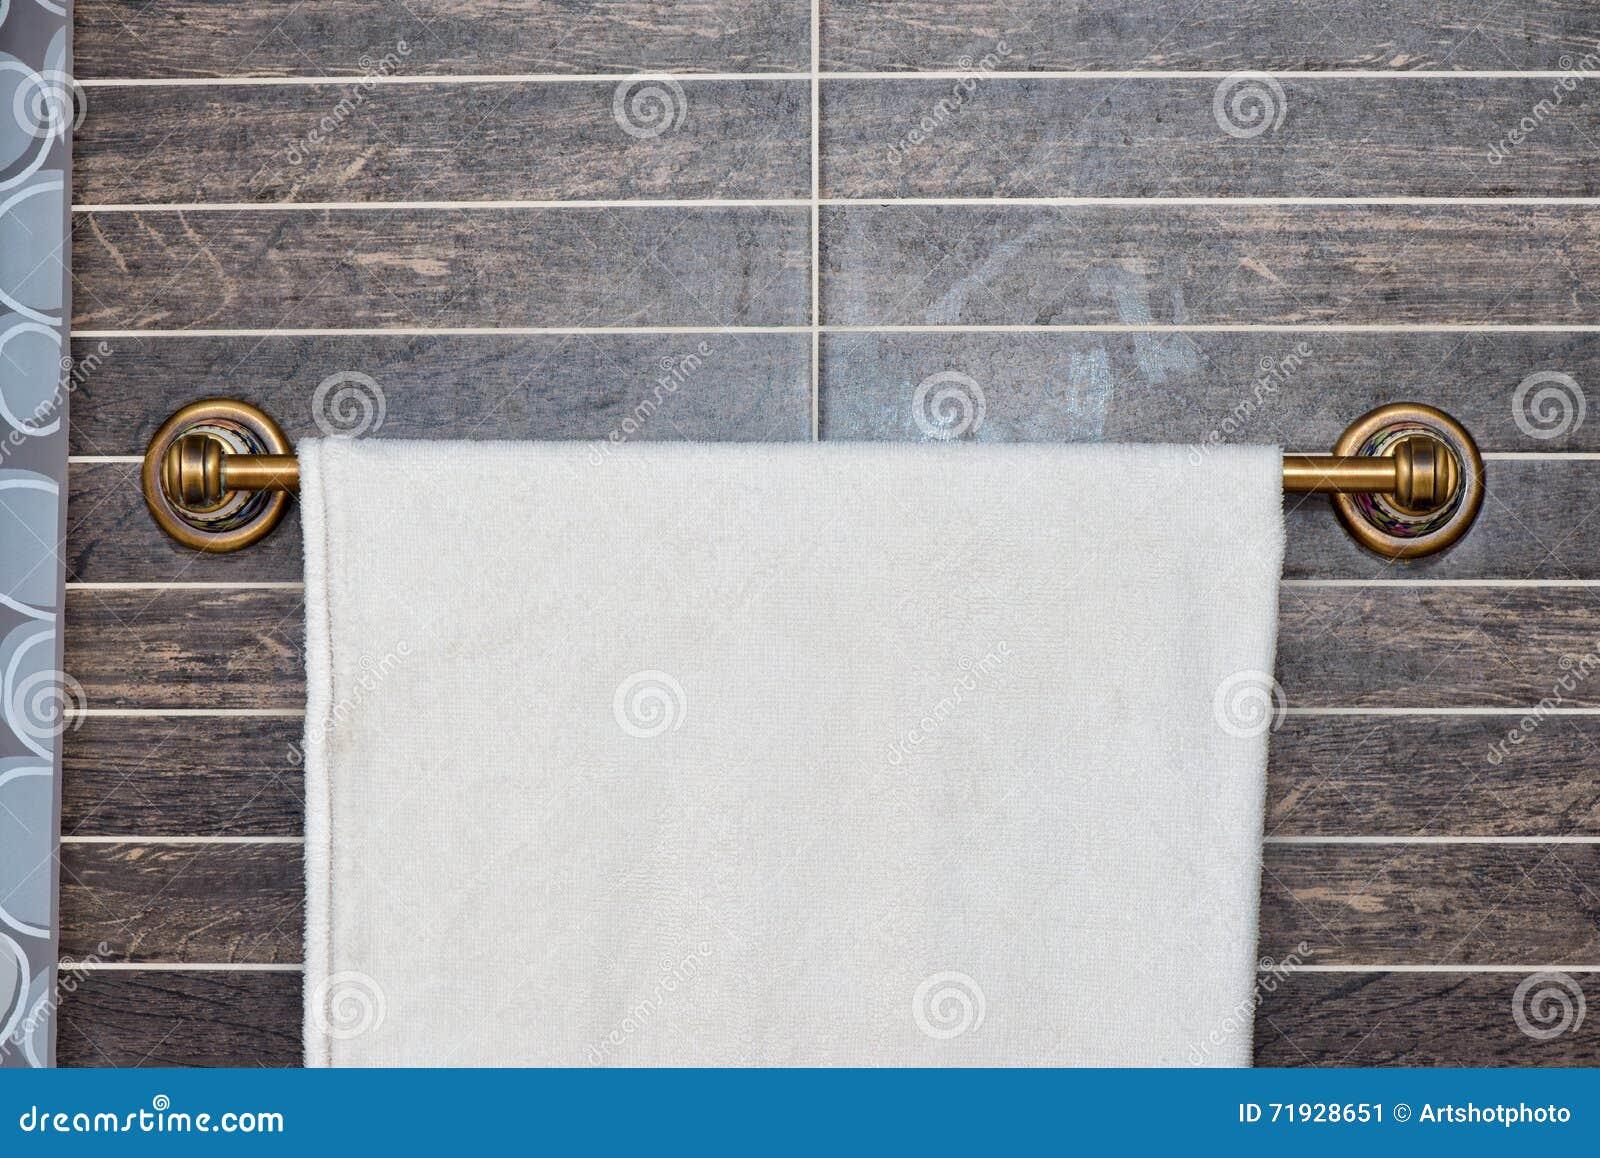 Белое полотенце на вешалке